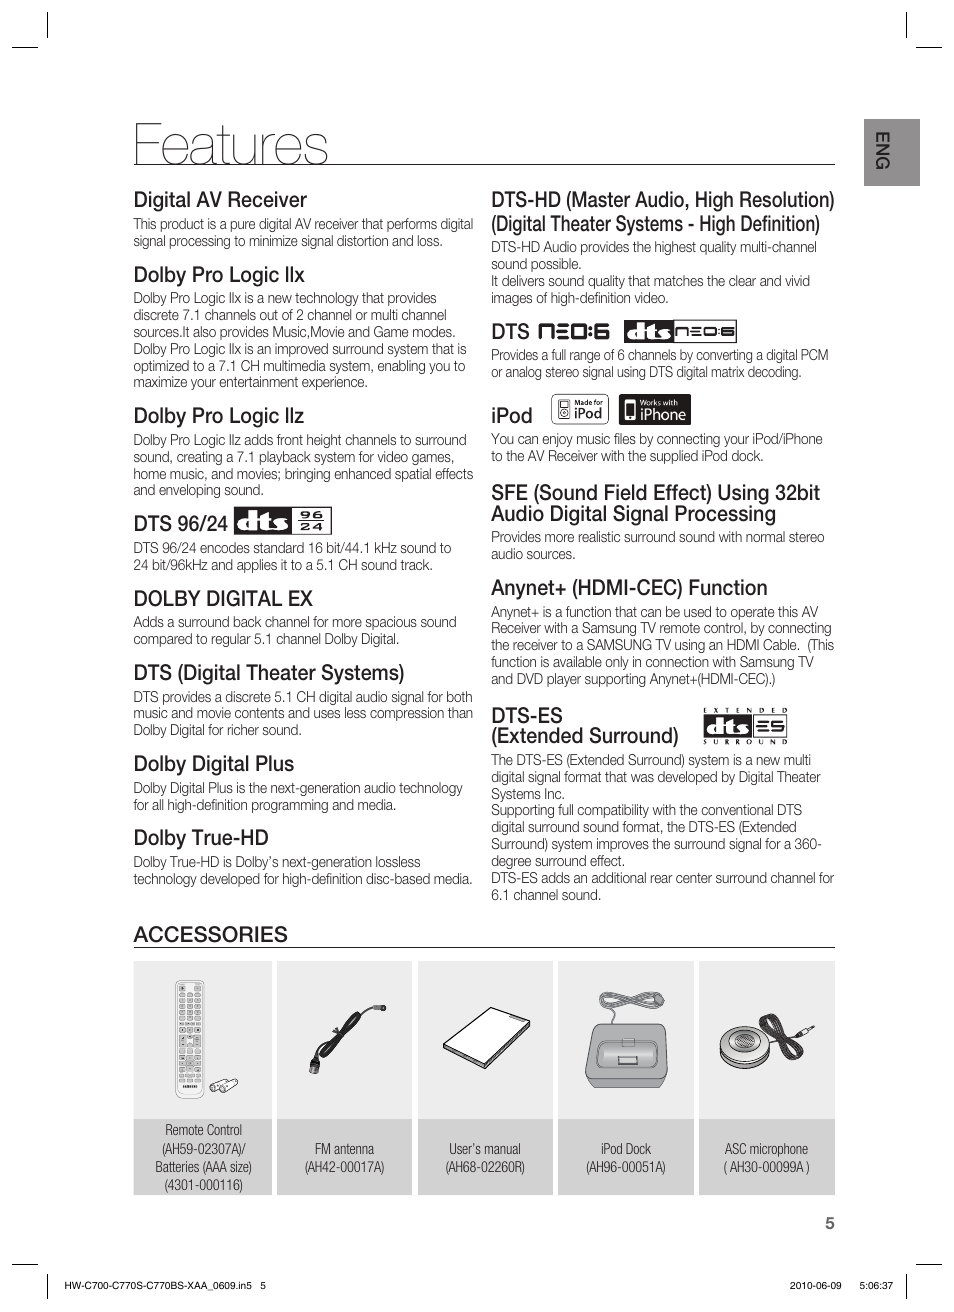 Features, Digital av receiver, Dolby pro logic llx   Samsung HW-C700B-XAA  User Manual   Page 5 / 62